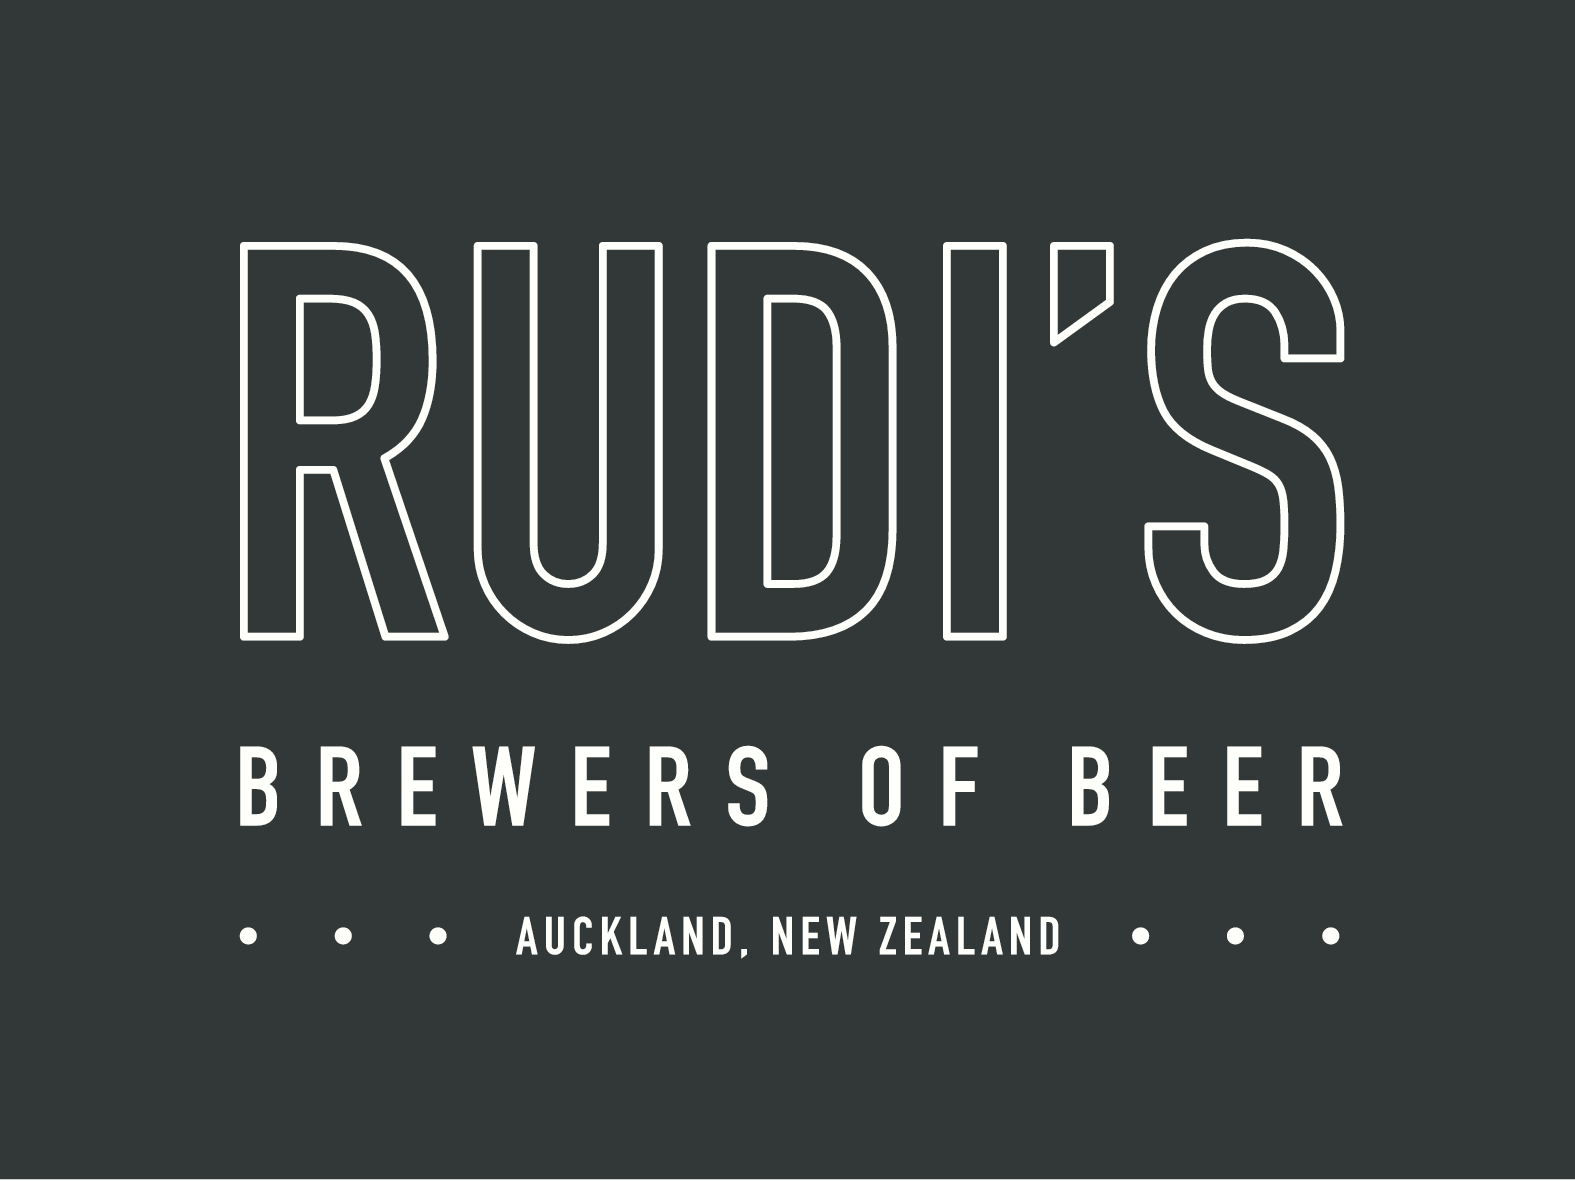 Rudis_Auckland_logo_reverse.png